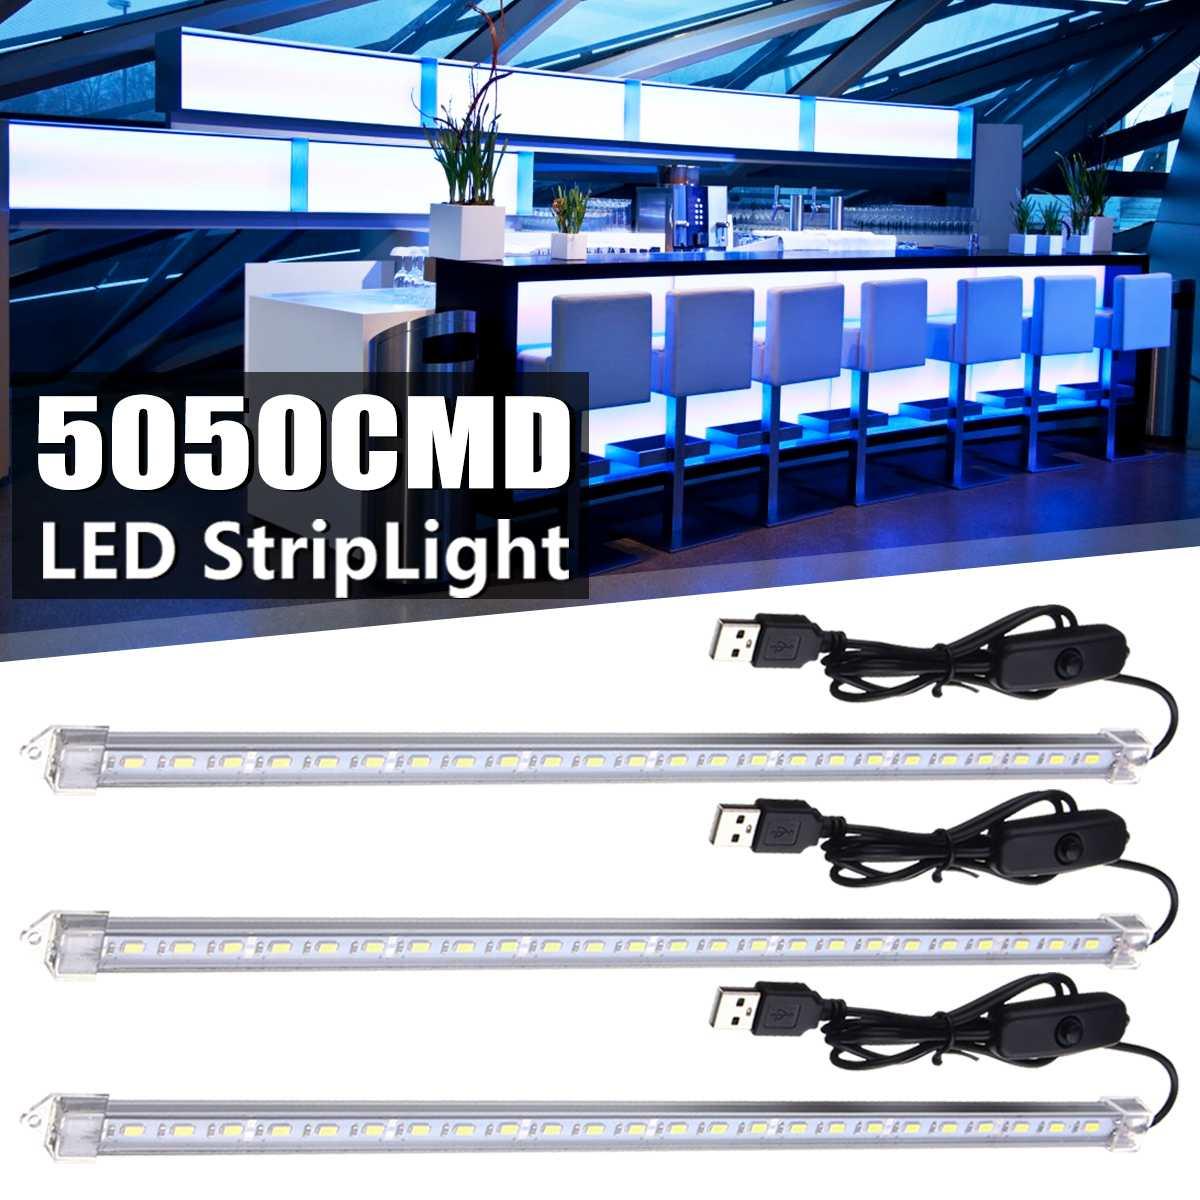 35CM USB LED Tube With Switch 7W 24 SMD 5630 USB LED Rigid Strip Hard Bar Light Tube Lamp DC5V